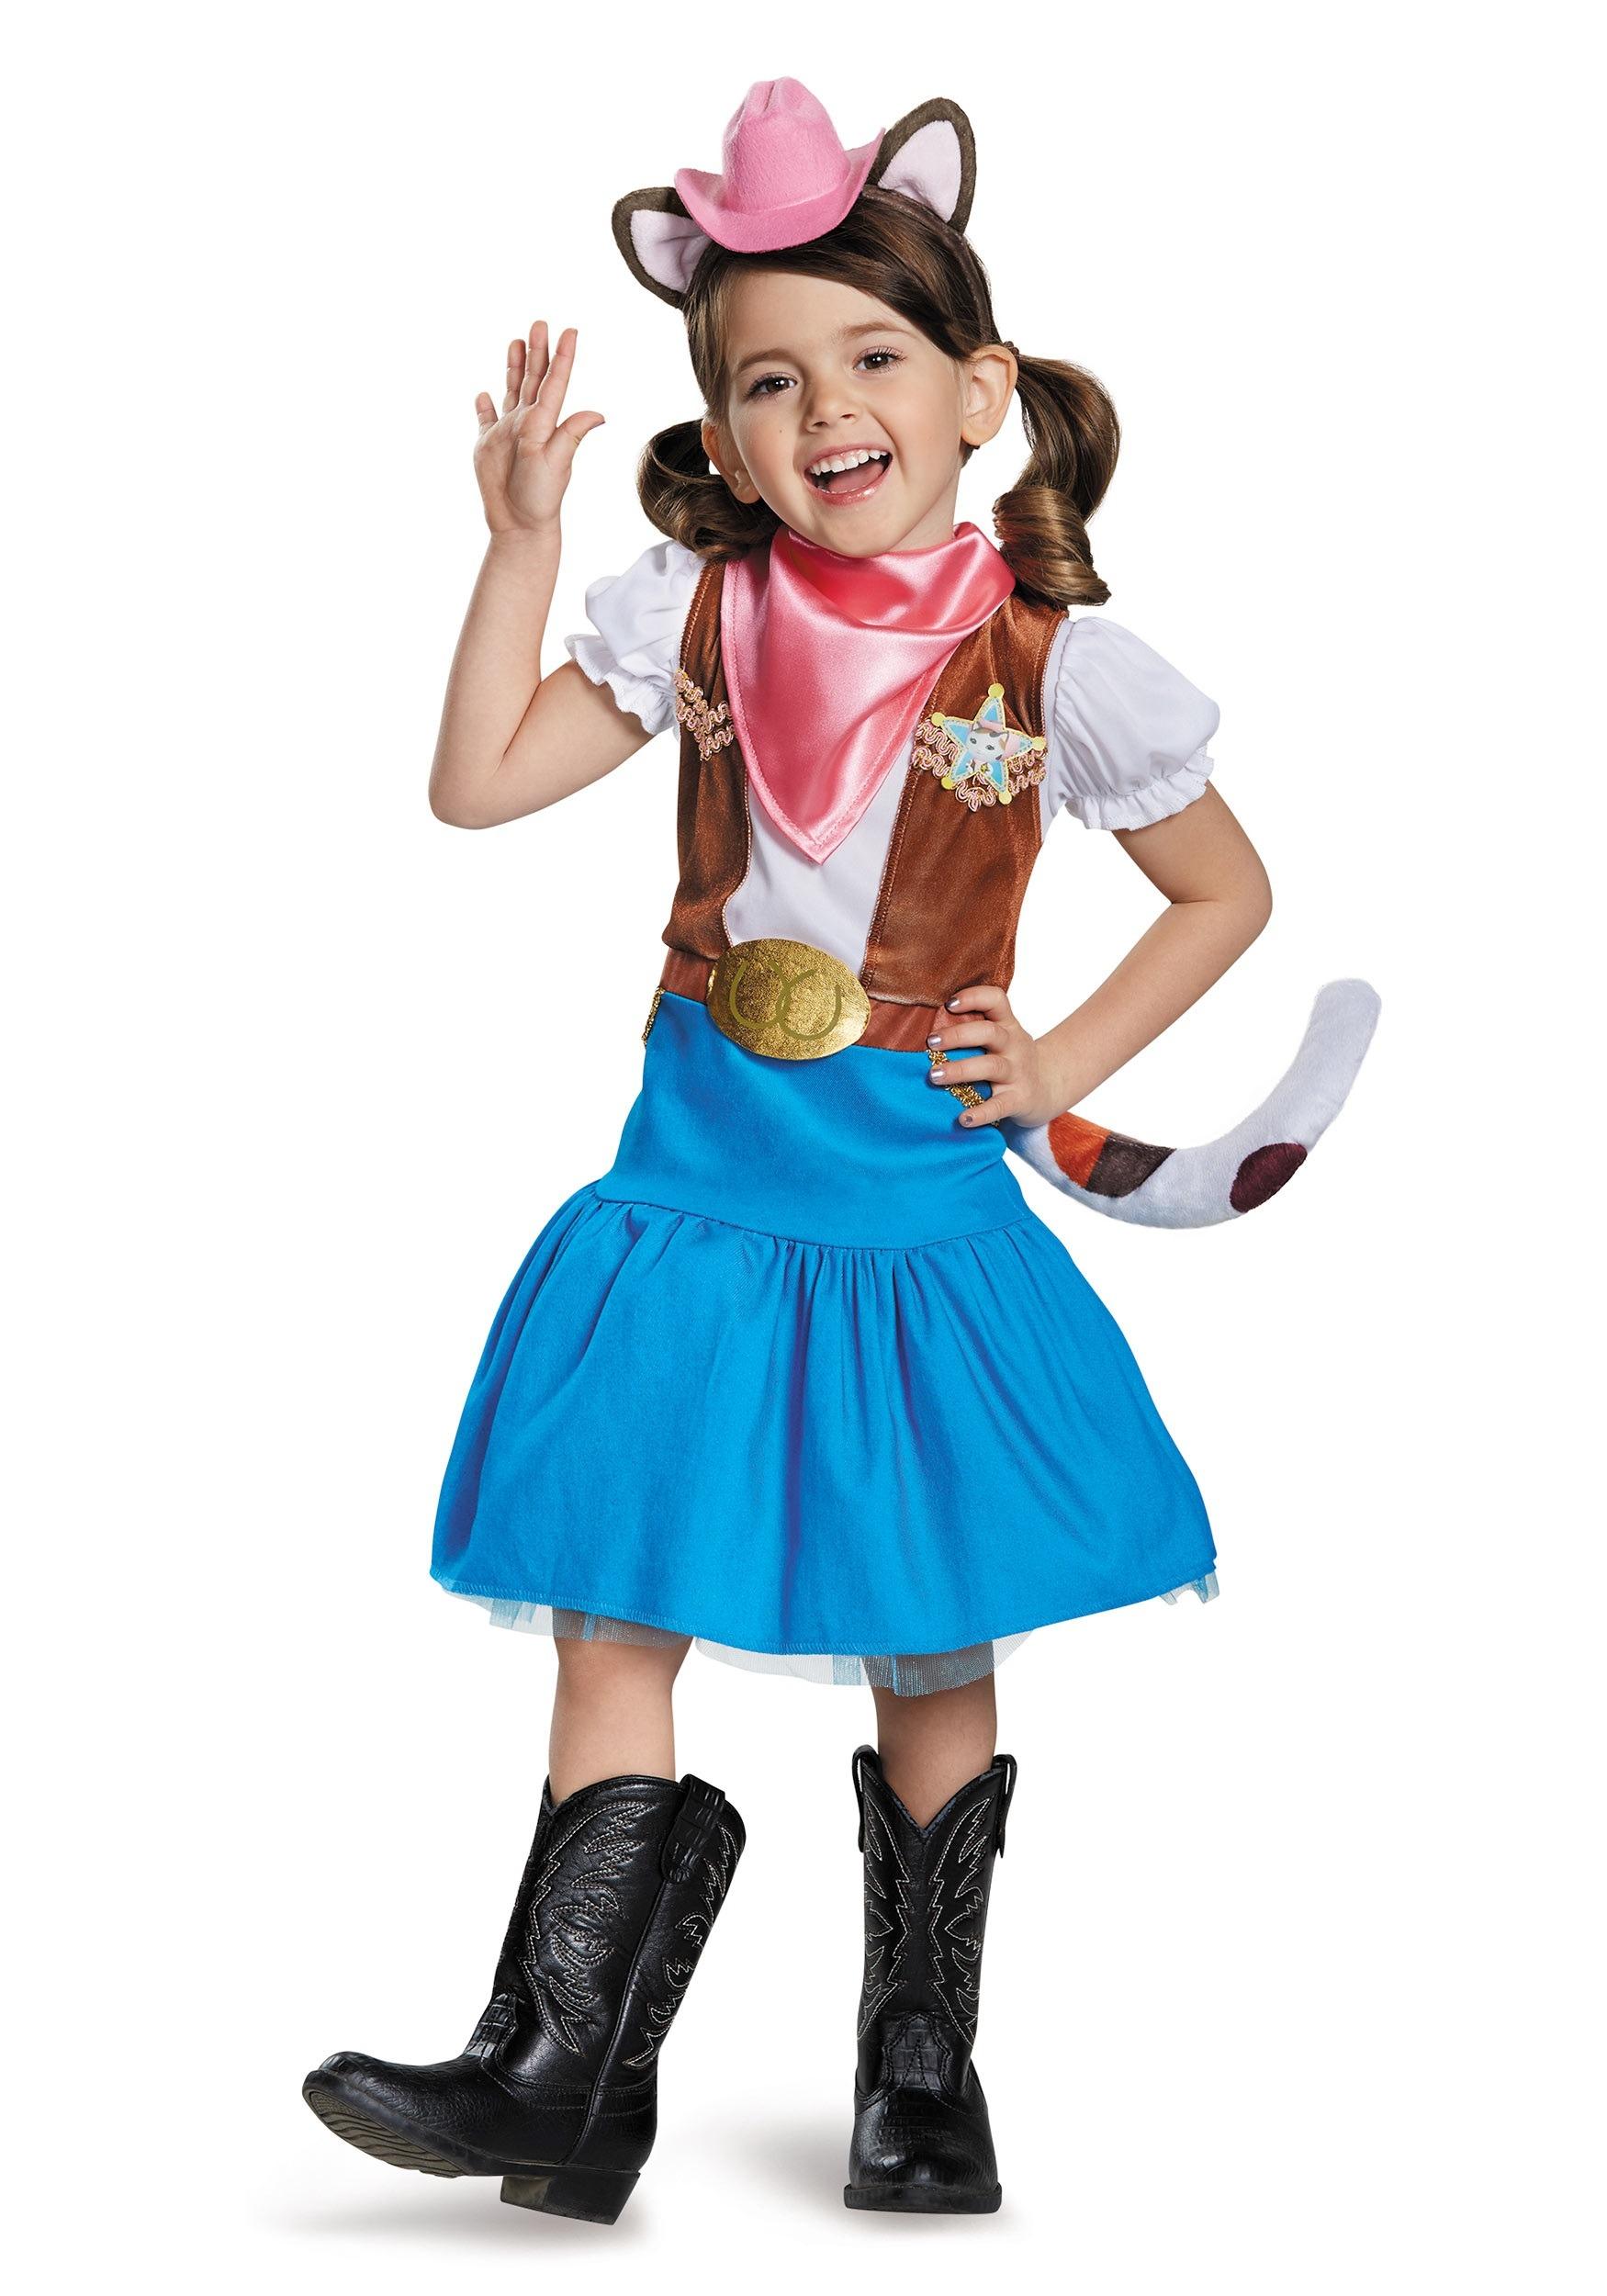 Sherriff callie costume